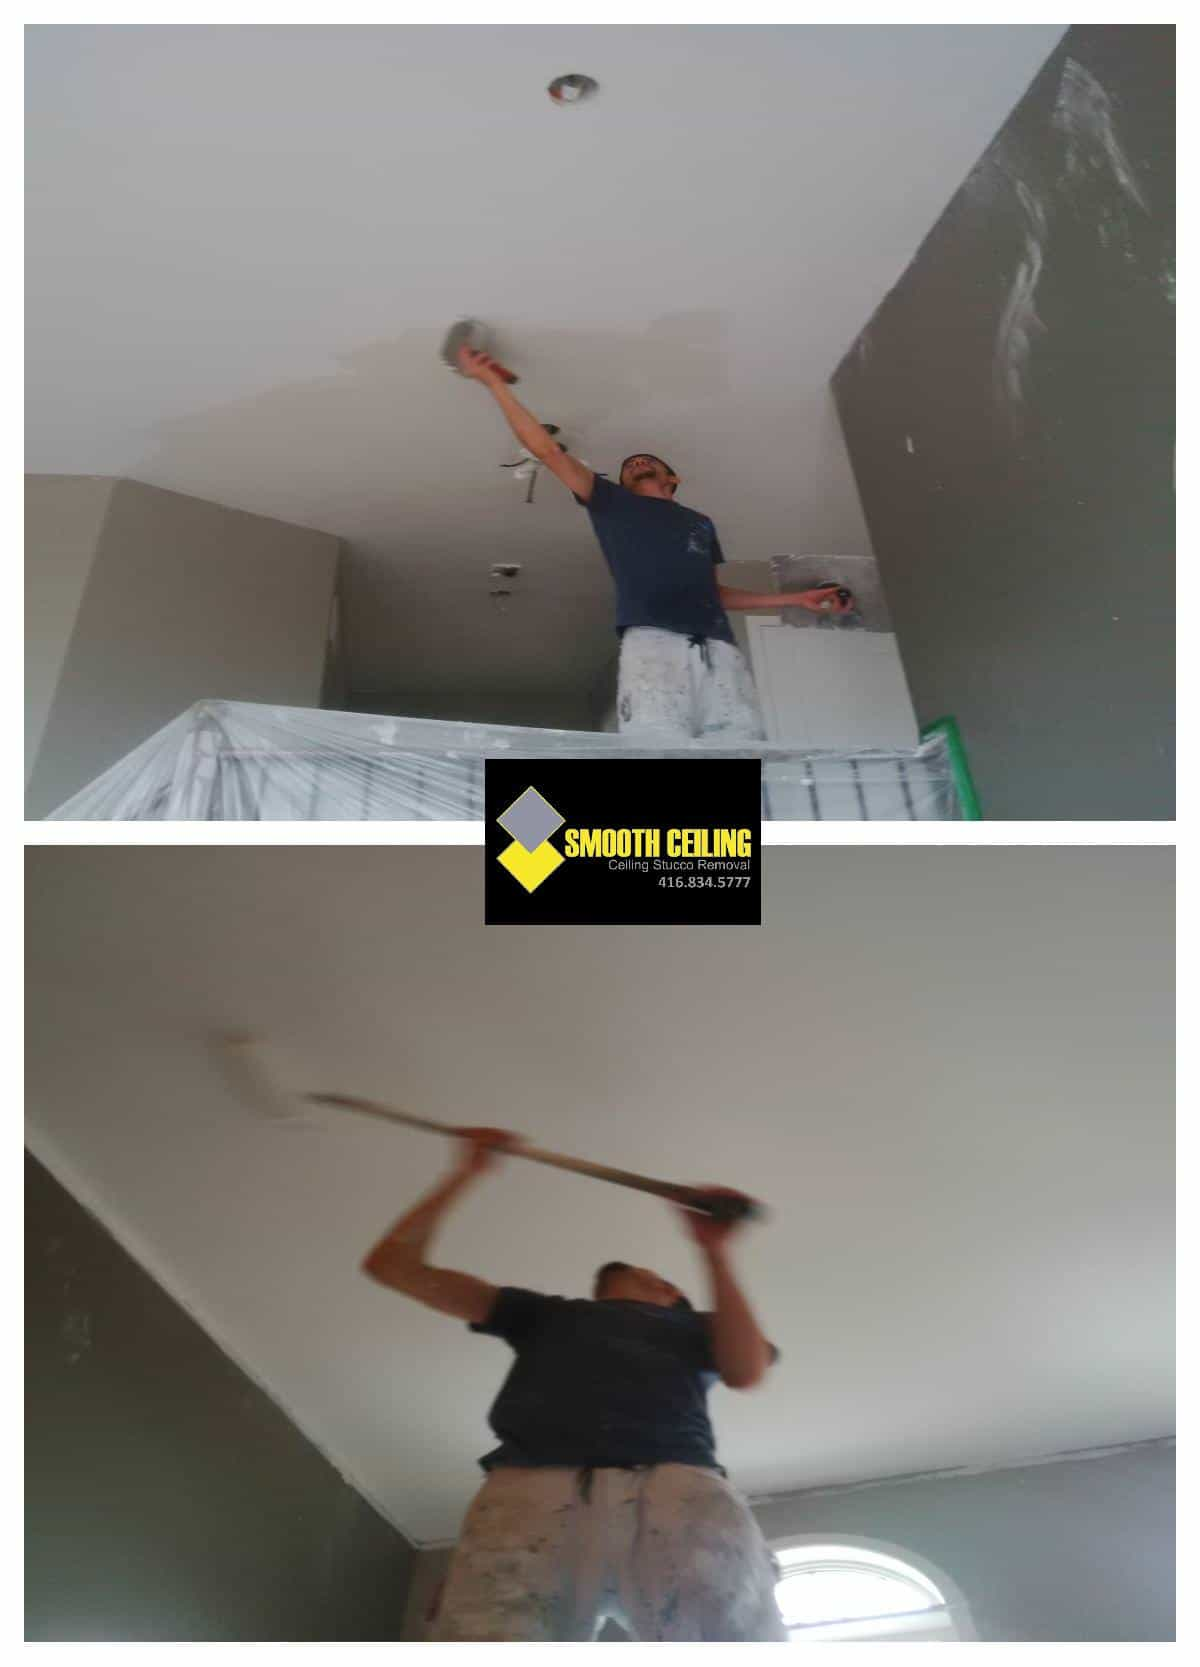 Ceiling preparation